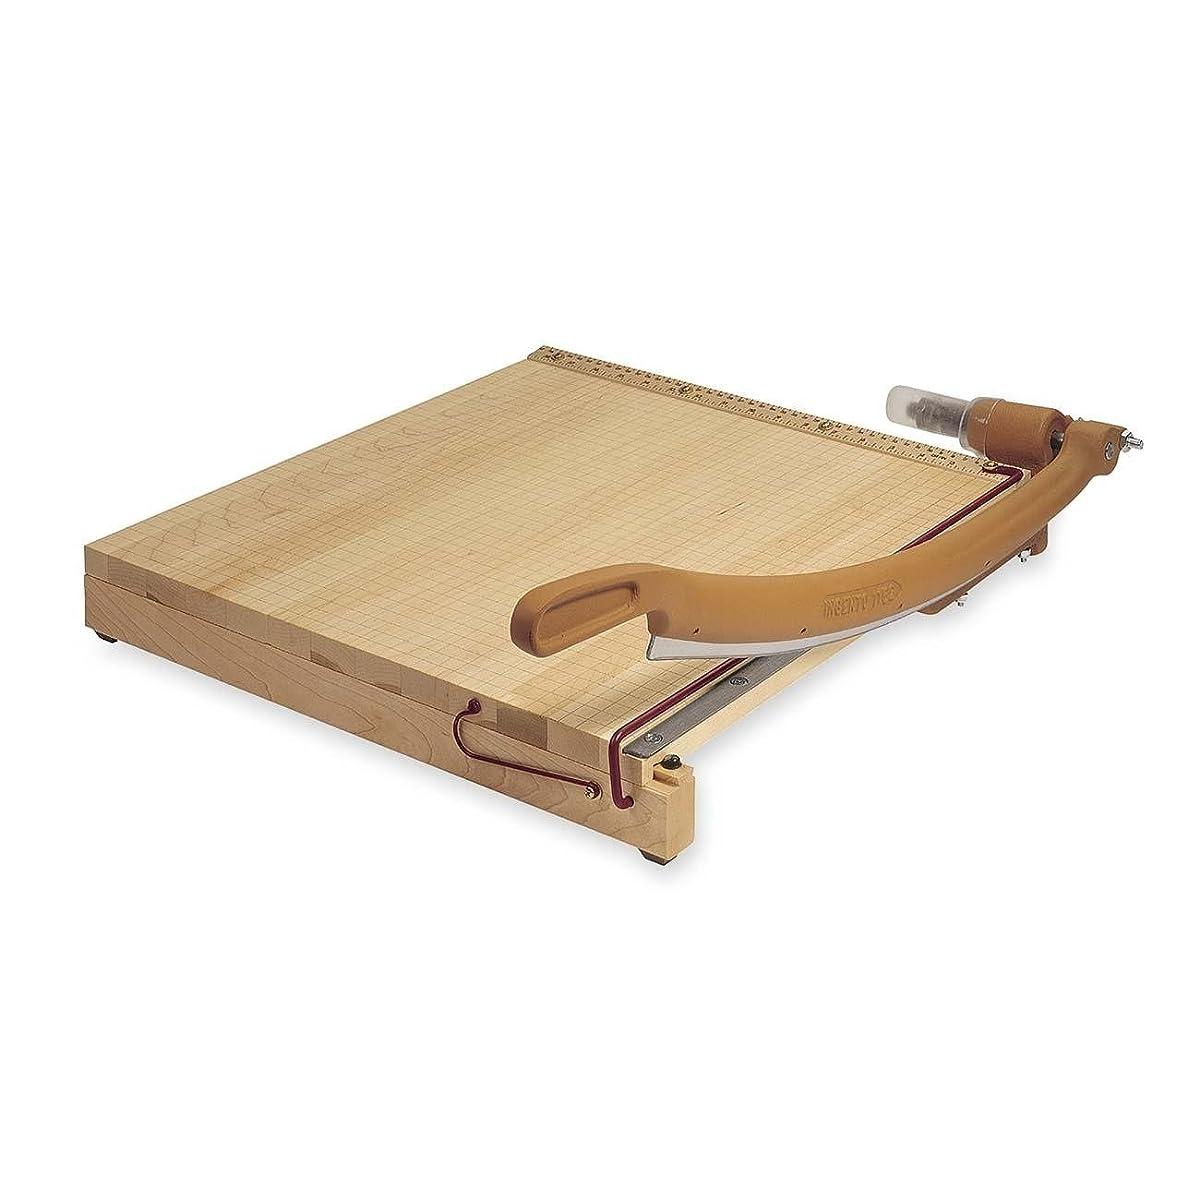 "Swingline Paper Trimmer / Cutter, Guillotine, 24"" Cut Length, 15 Sheet Capacity, ClassicCut Ingento (1162)"